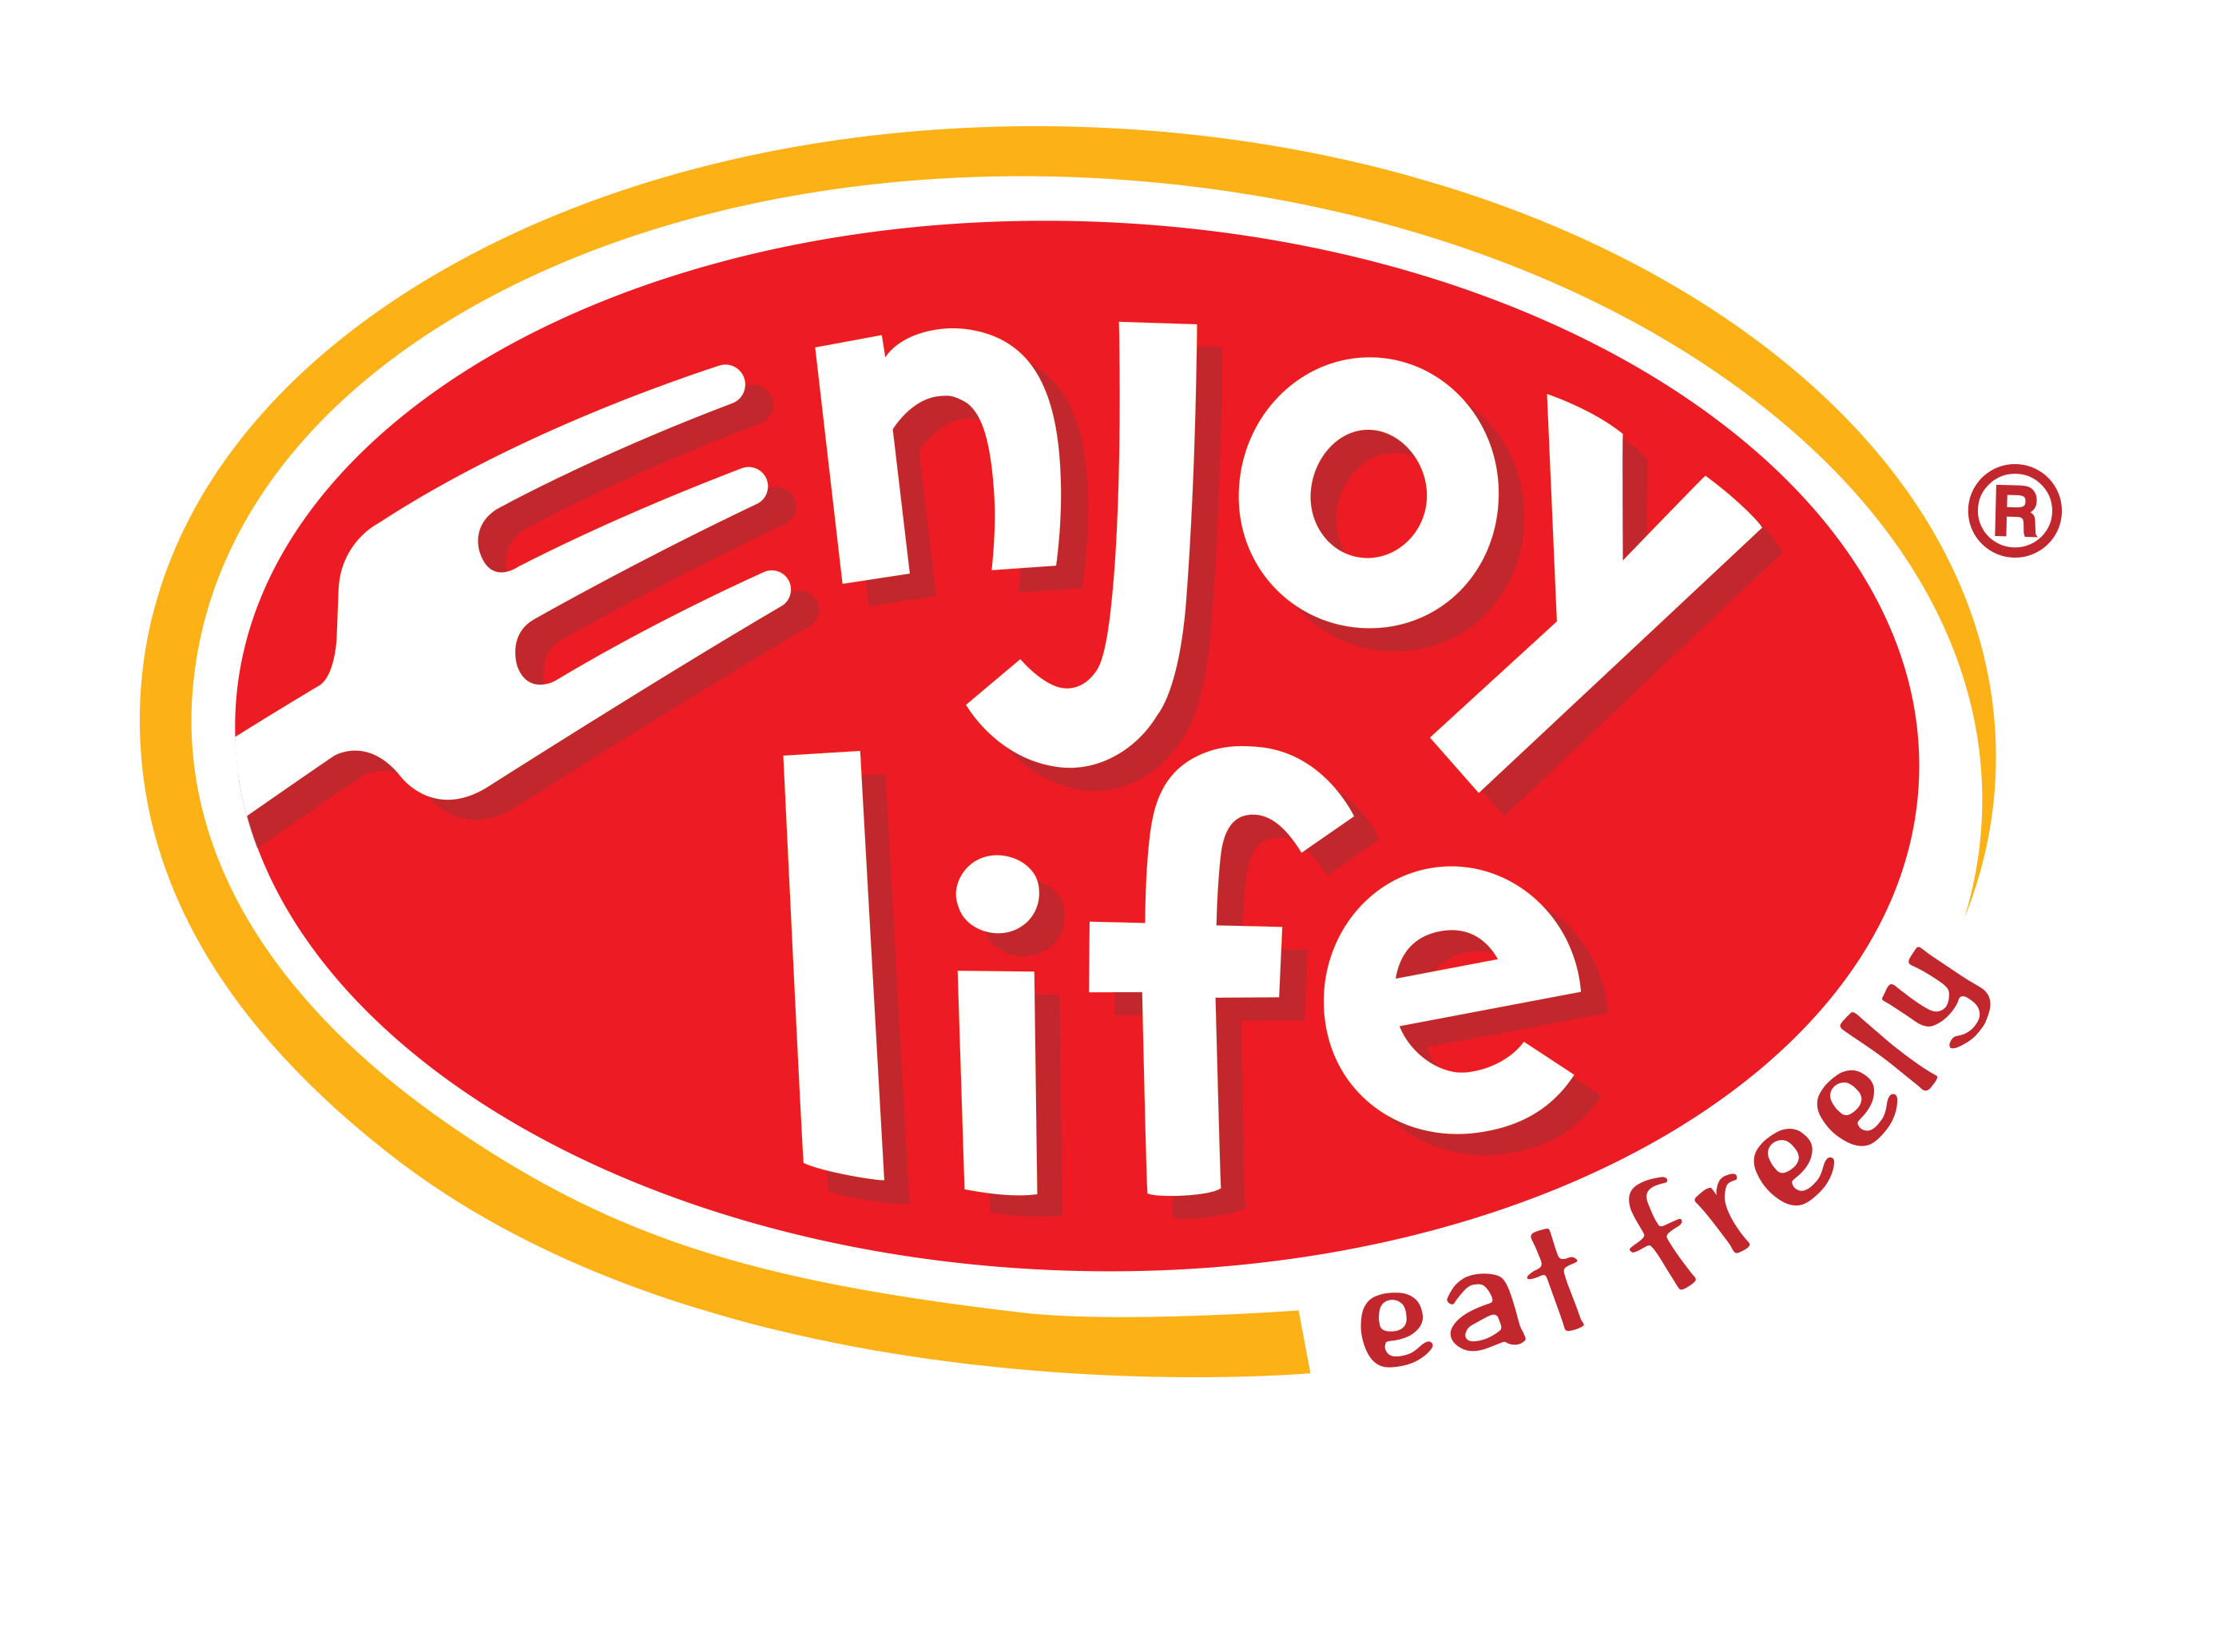 Enjoy Life - Eat Freely